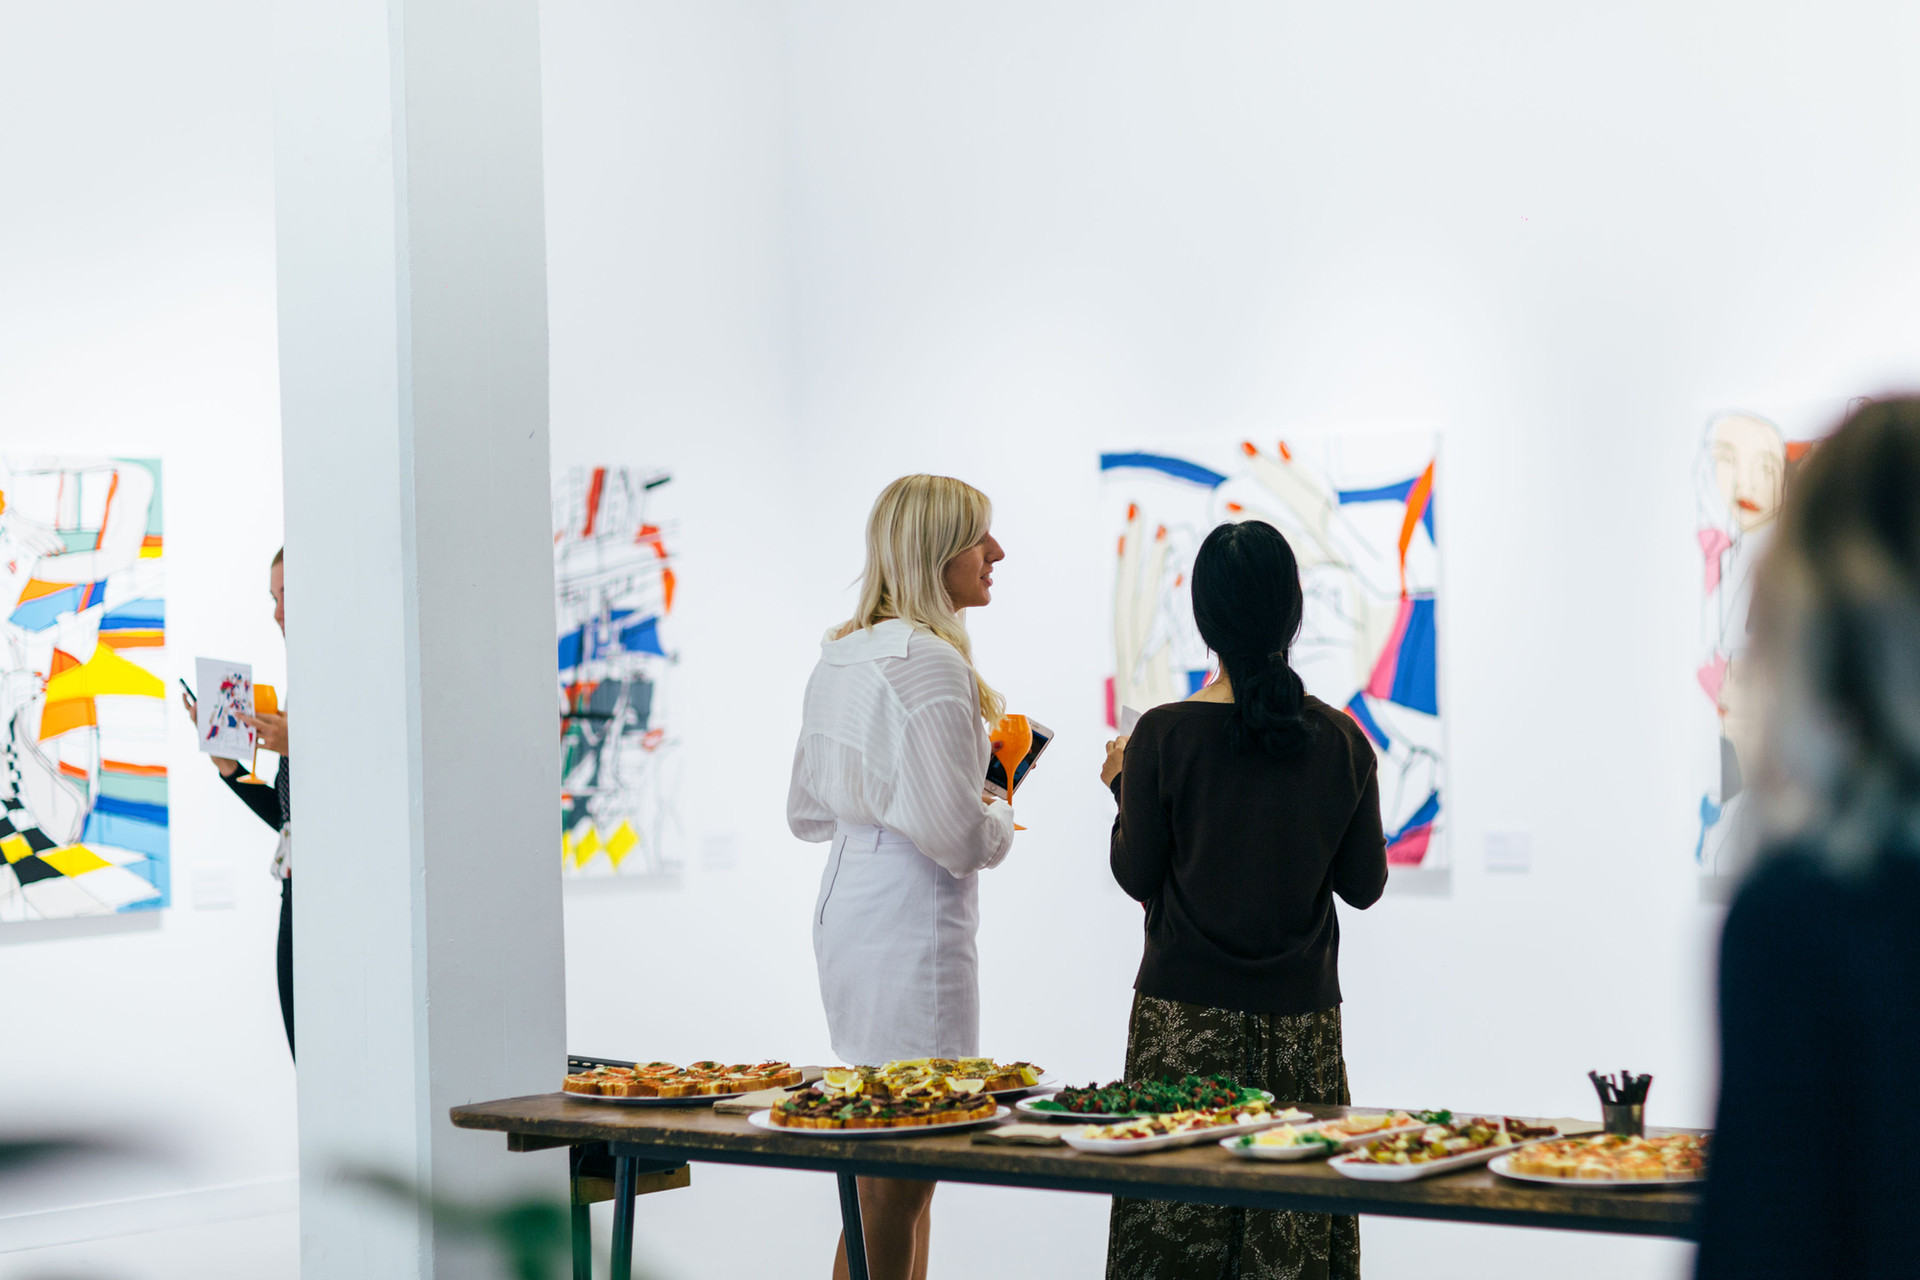 Merging Faces Exhibition, Allpress Studio, 2019